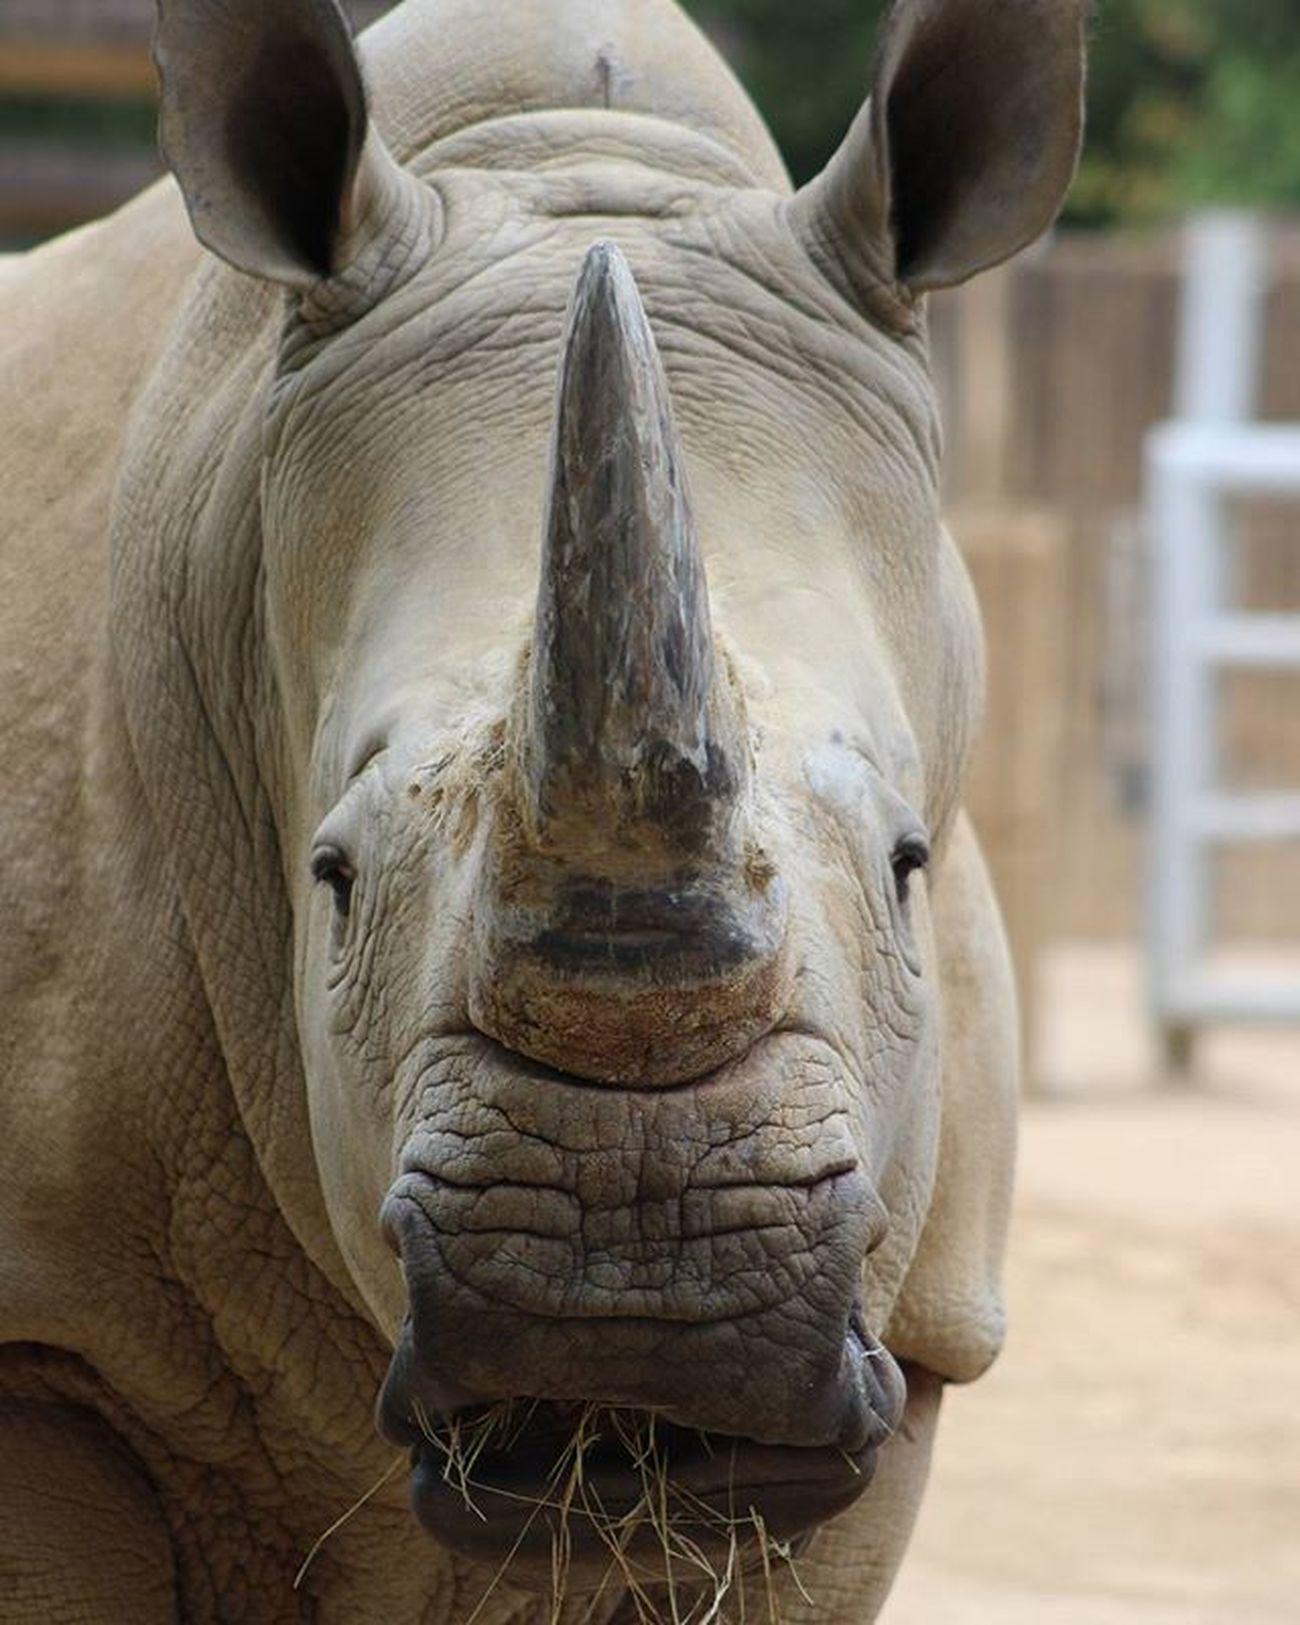 Savetherhino WhiteRhino Wildlife Wildlifephotography MemphisZoo Renoster